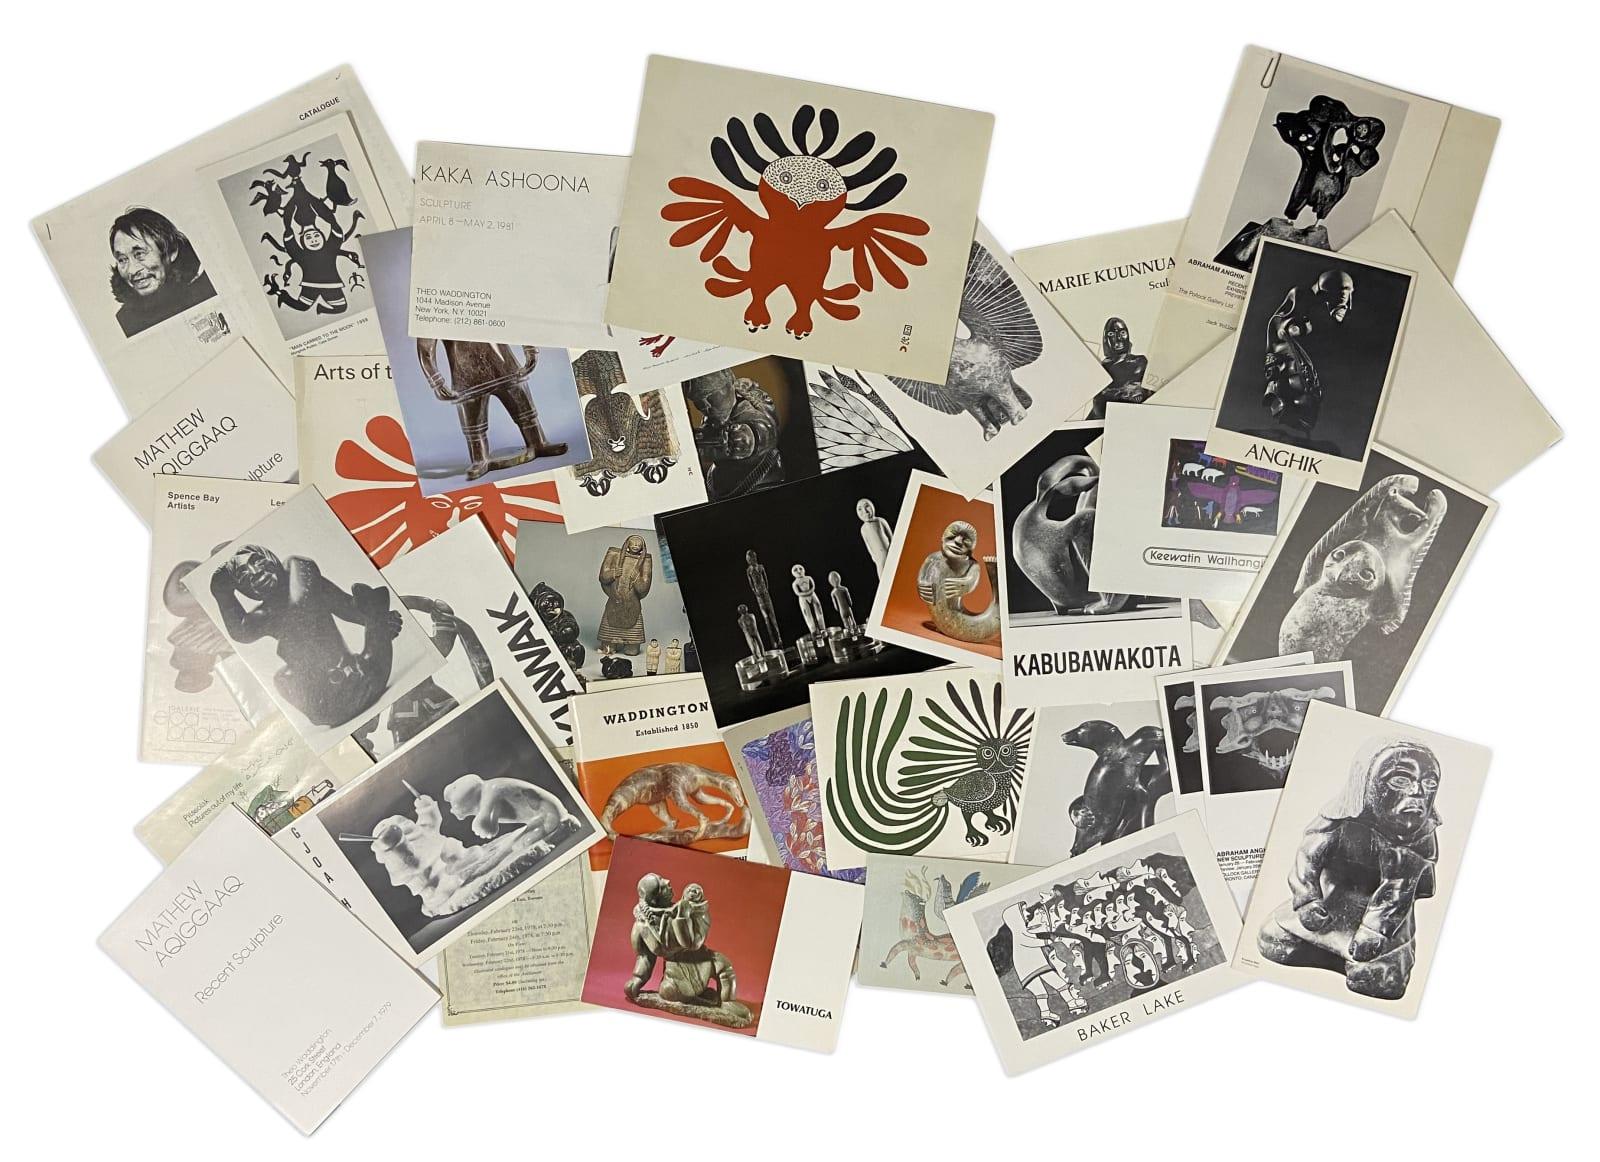 Lot 81 Quantity of Inuit Art Ephemera Estimate: $100 — $200 price realized: $390